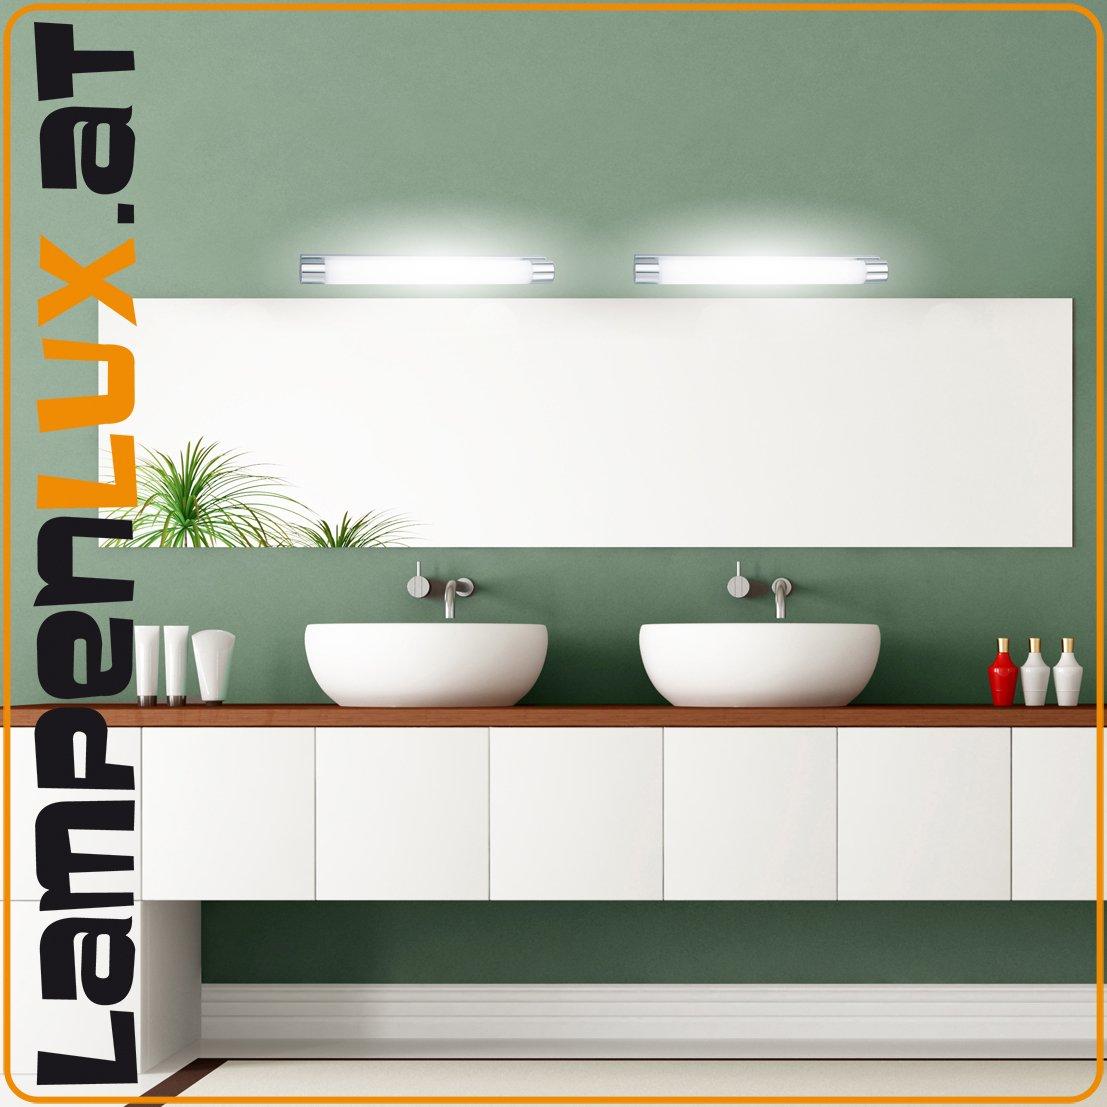 Lampenlux Wandlampe Prado Wandleuchte Badlampe Küchenlampe Küchenleuchte Spiegelleuchte Unterbauleuchte Aluminium 37-70cm IP44 Gold Chrom Nickel